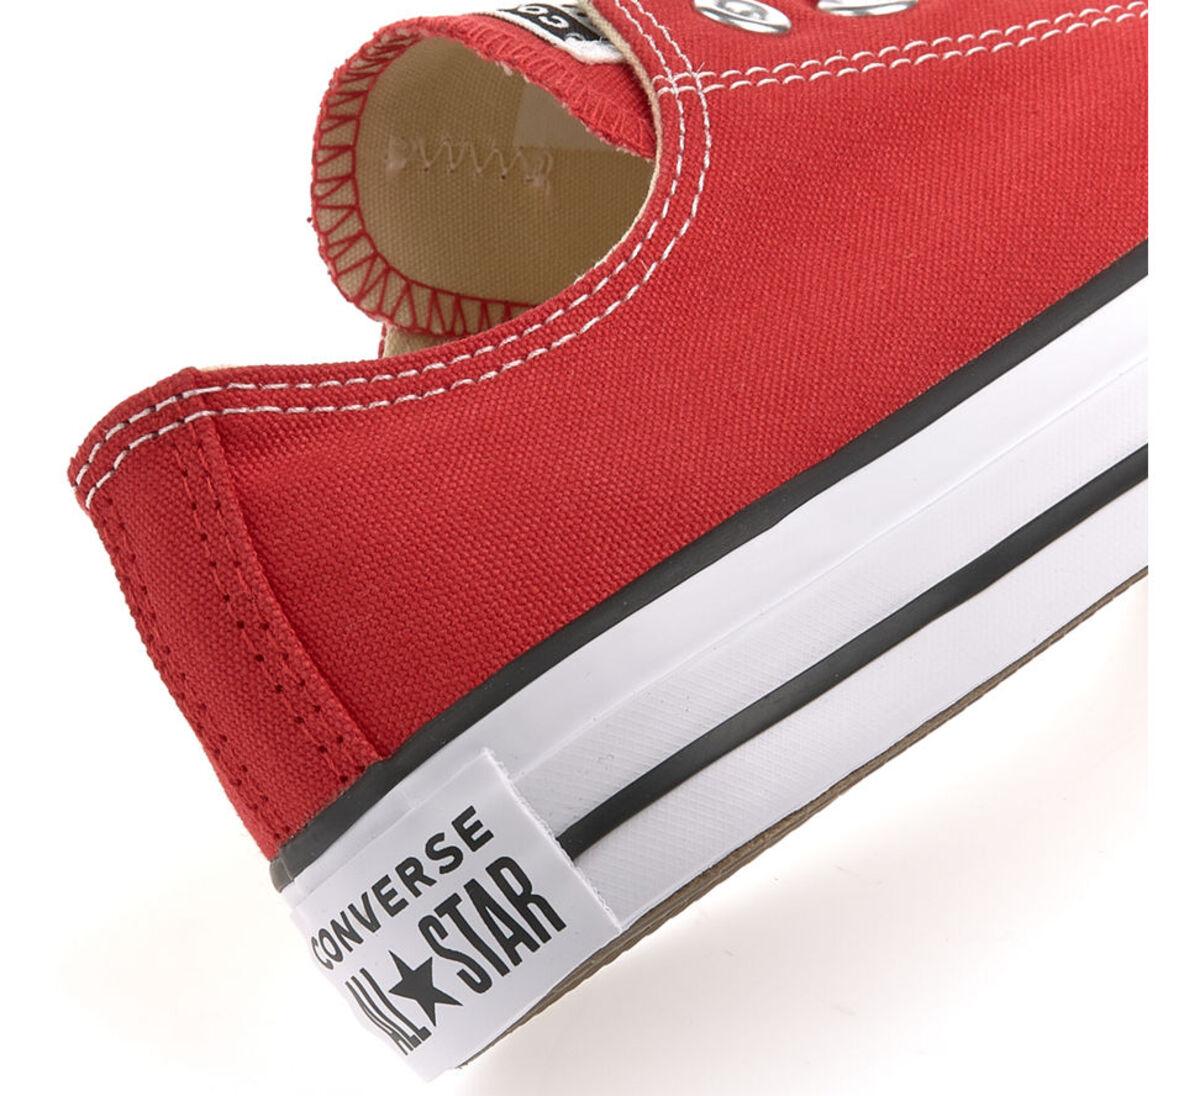 Bild 4 von Converse Sneaker - CHUCK TAYLOR ALL STAR OX